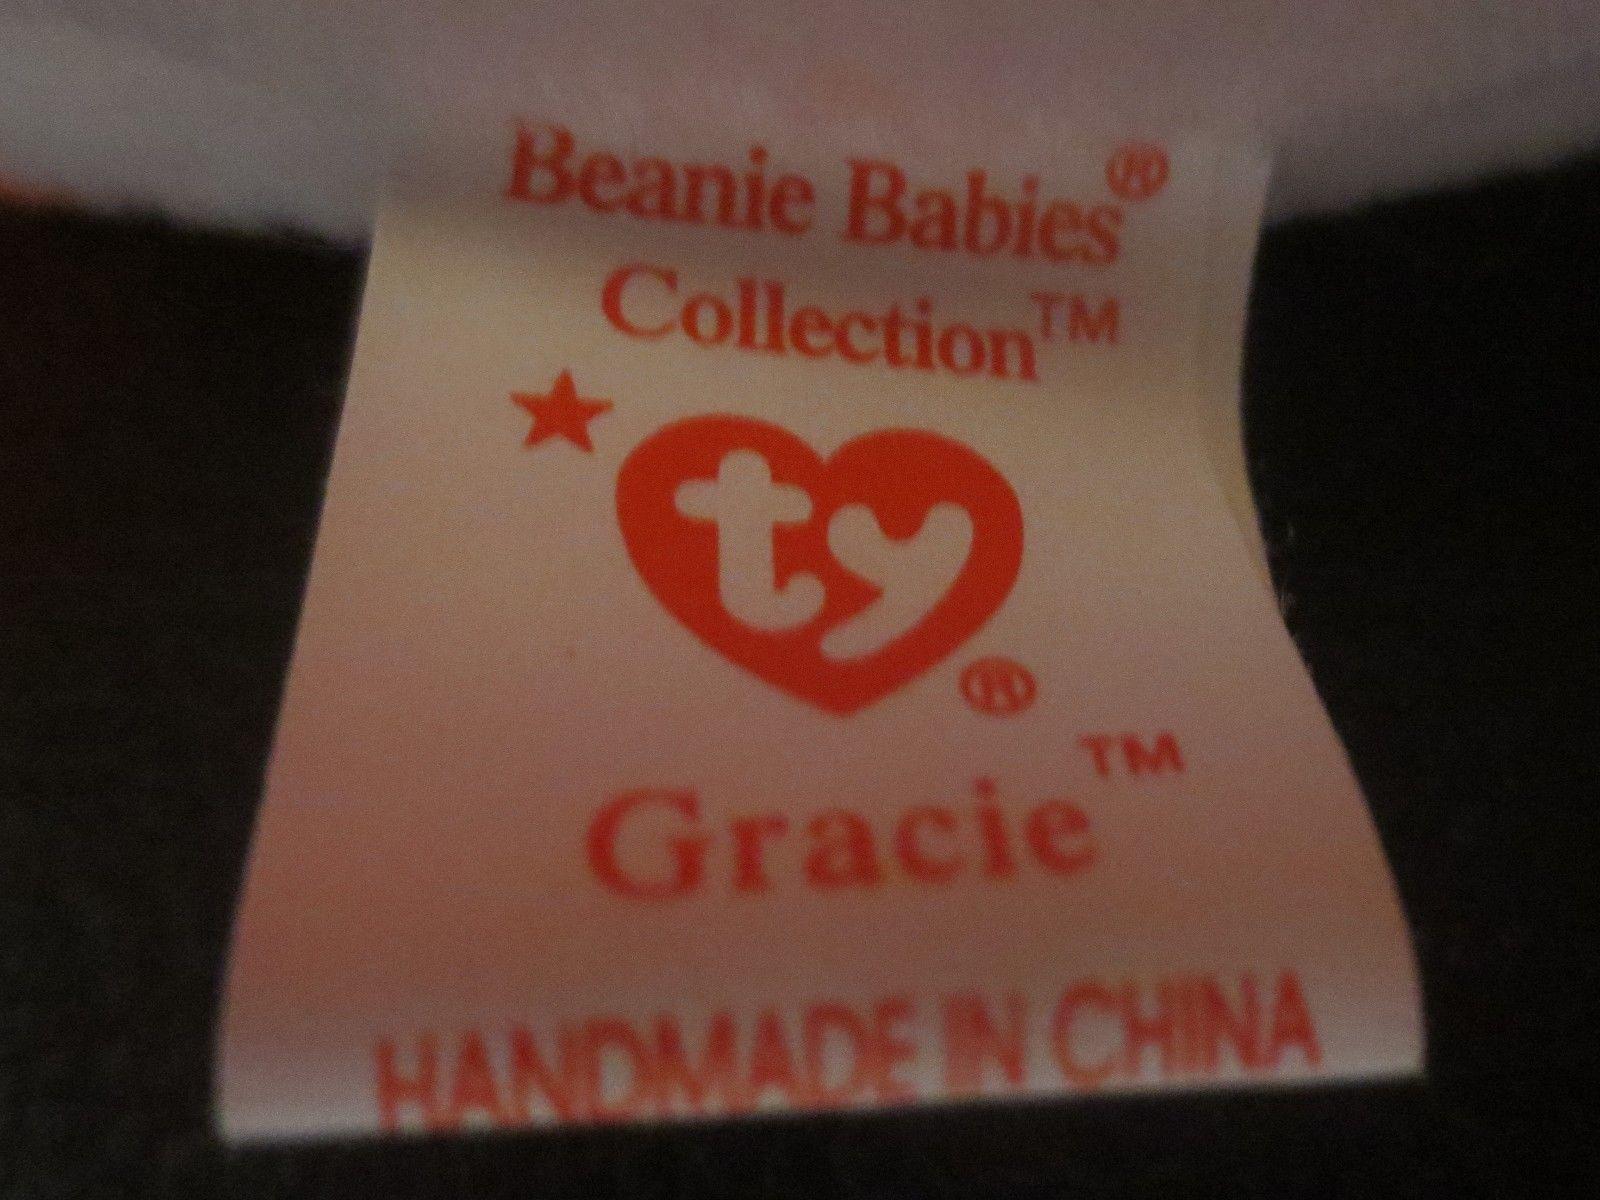 Ty Beanie Baby Gracie 4th Generation Hang Tag 4rd Generation Tush Tag 1996